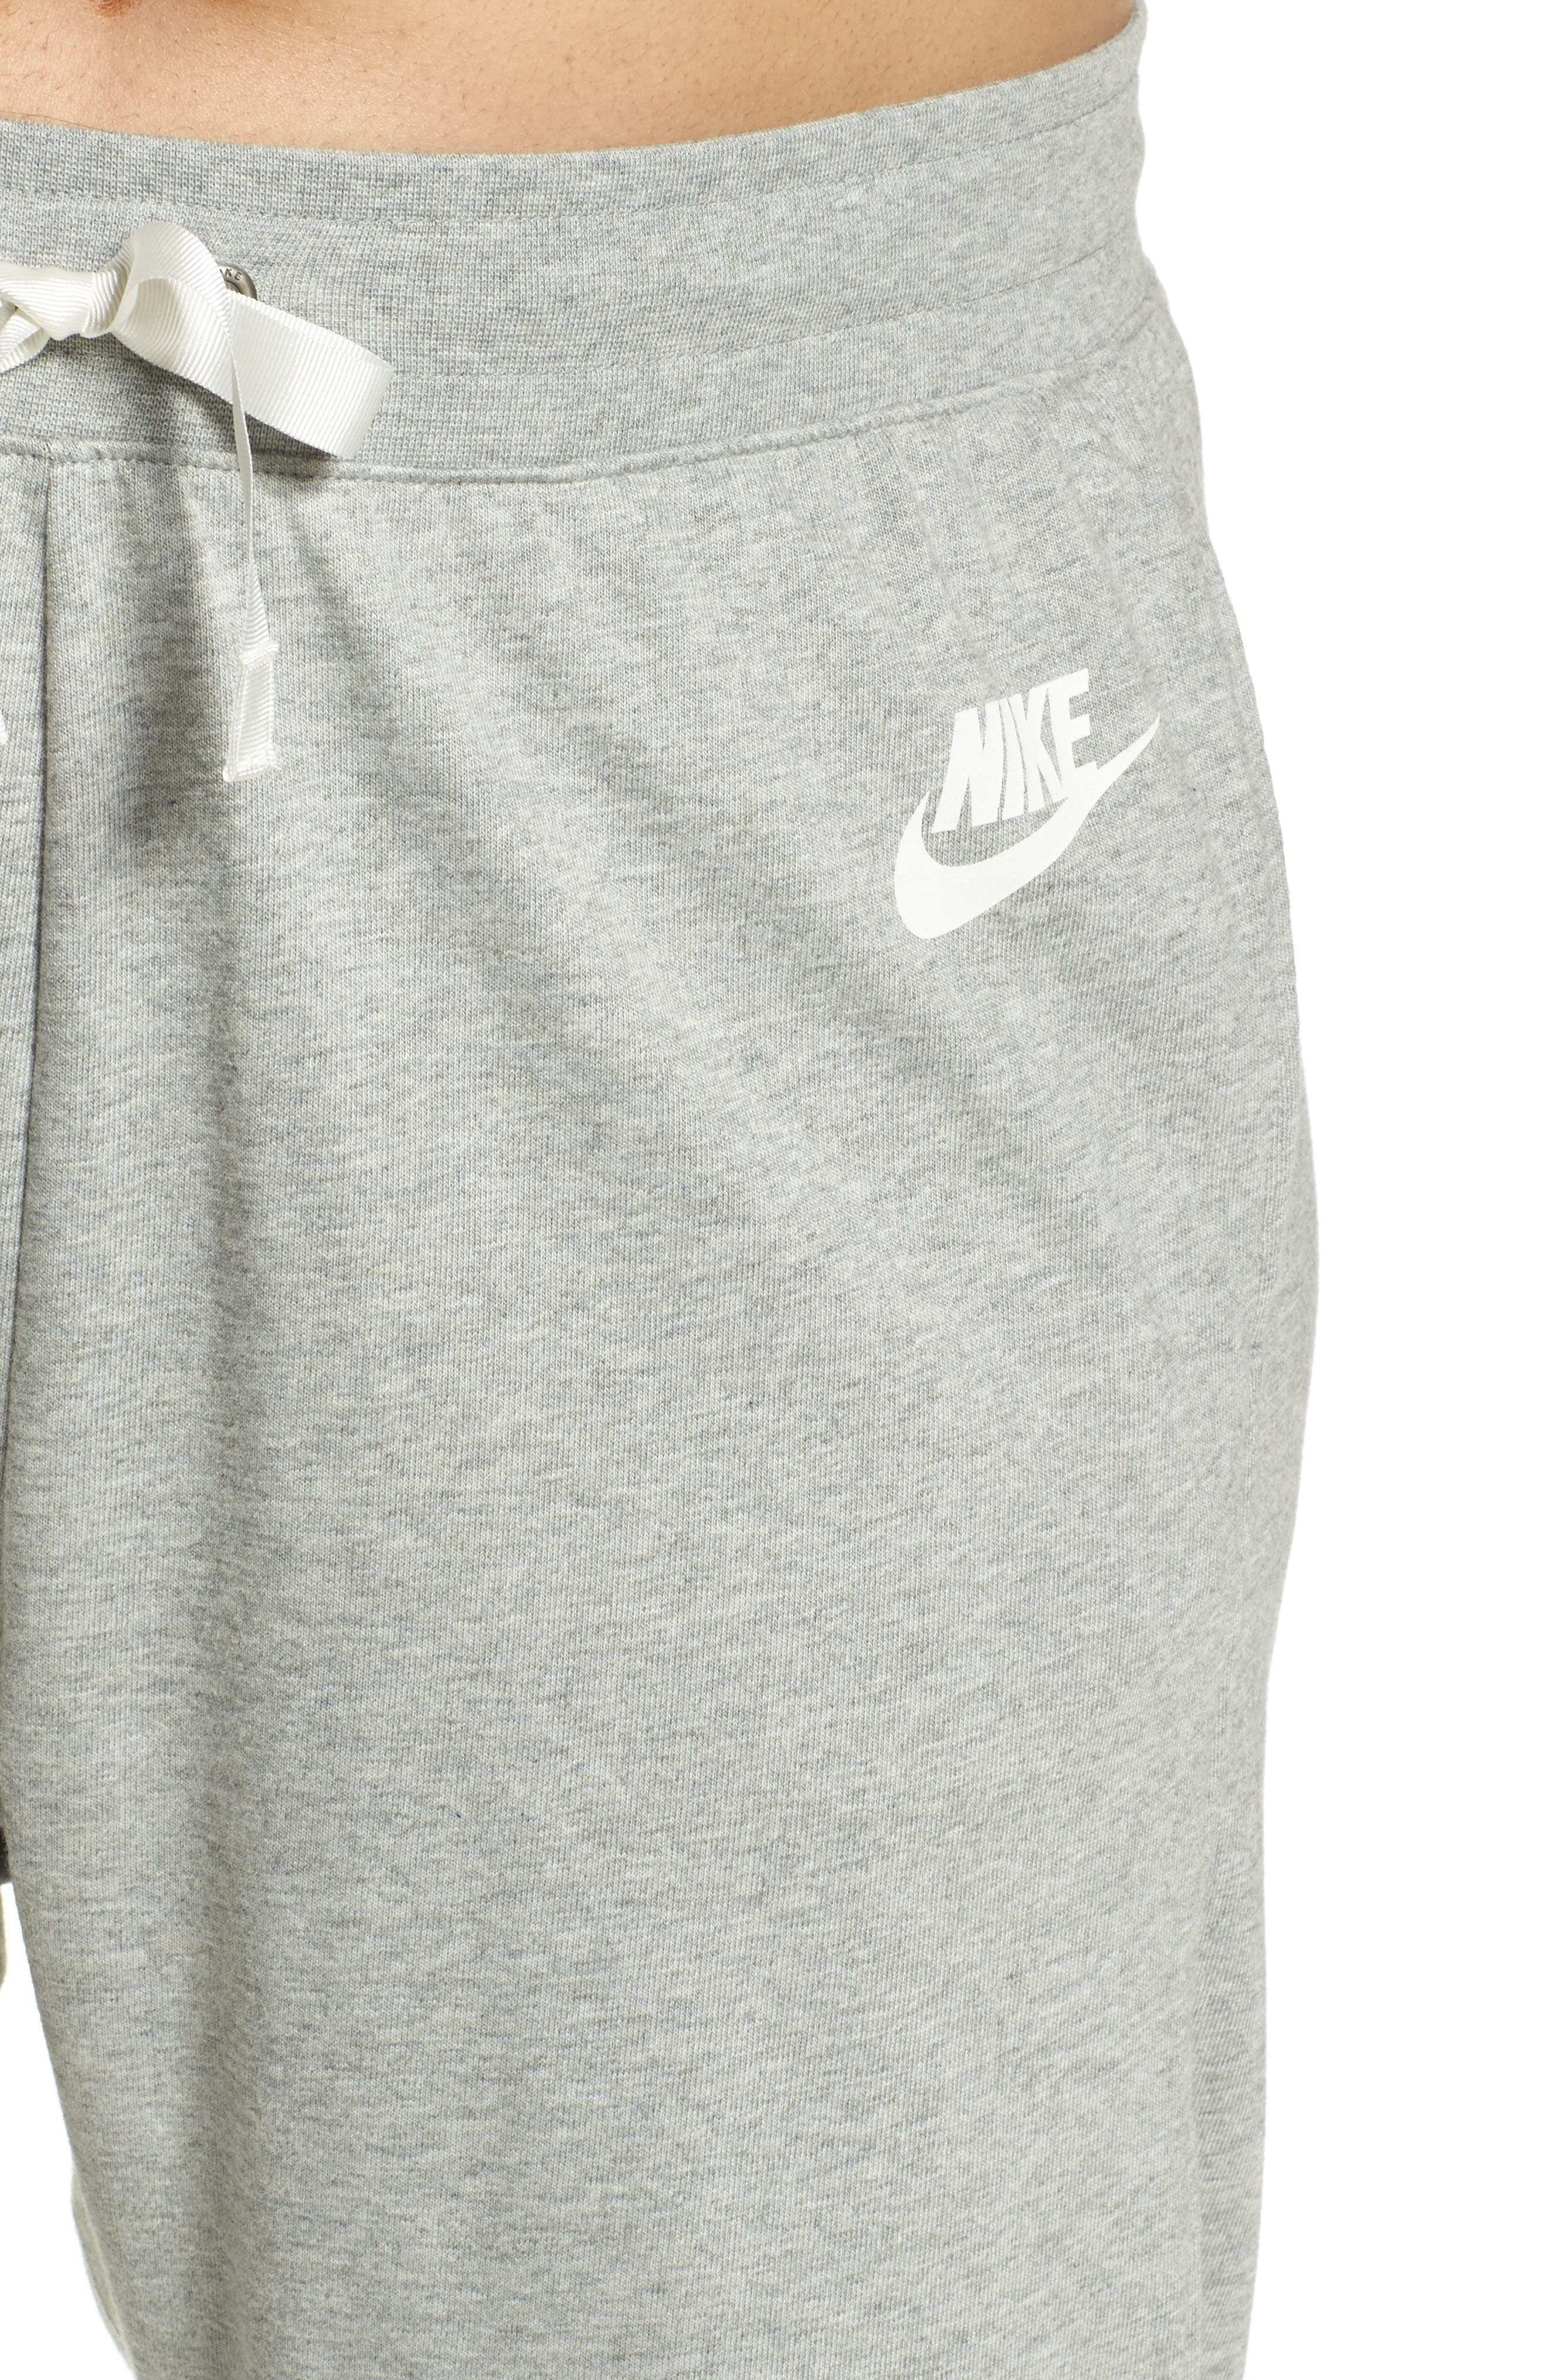 Sportswear Gym Classic Pants,                             Alternate thumbnail 4, color,                             Dk Grey Heather/ Sail